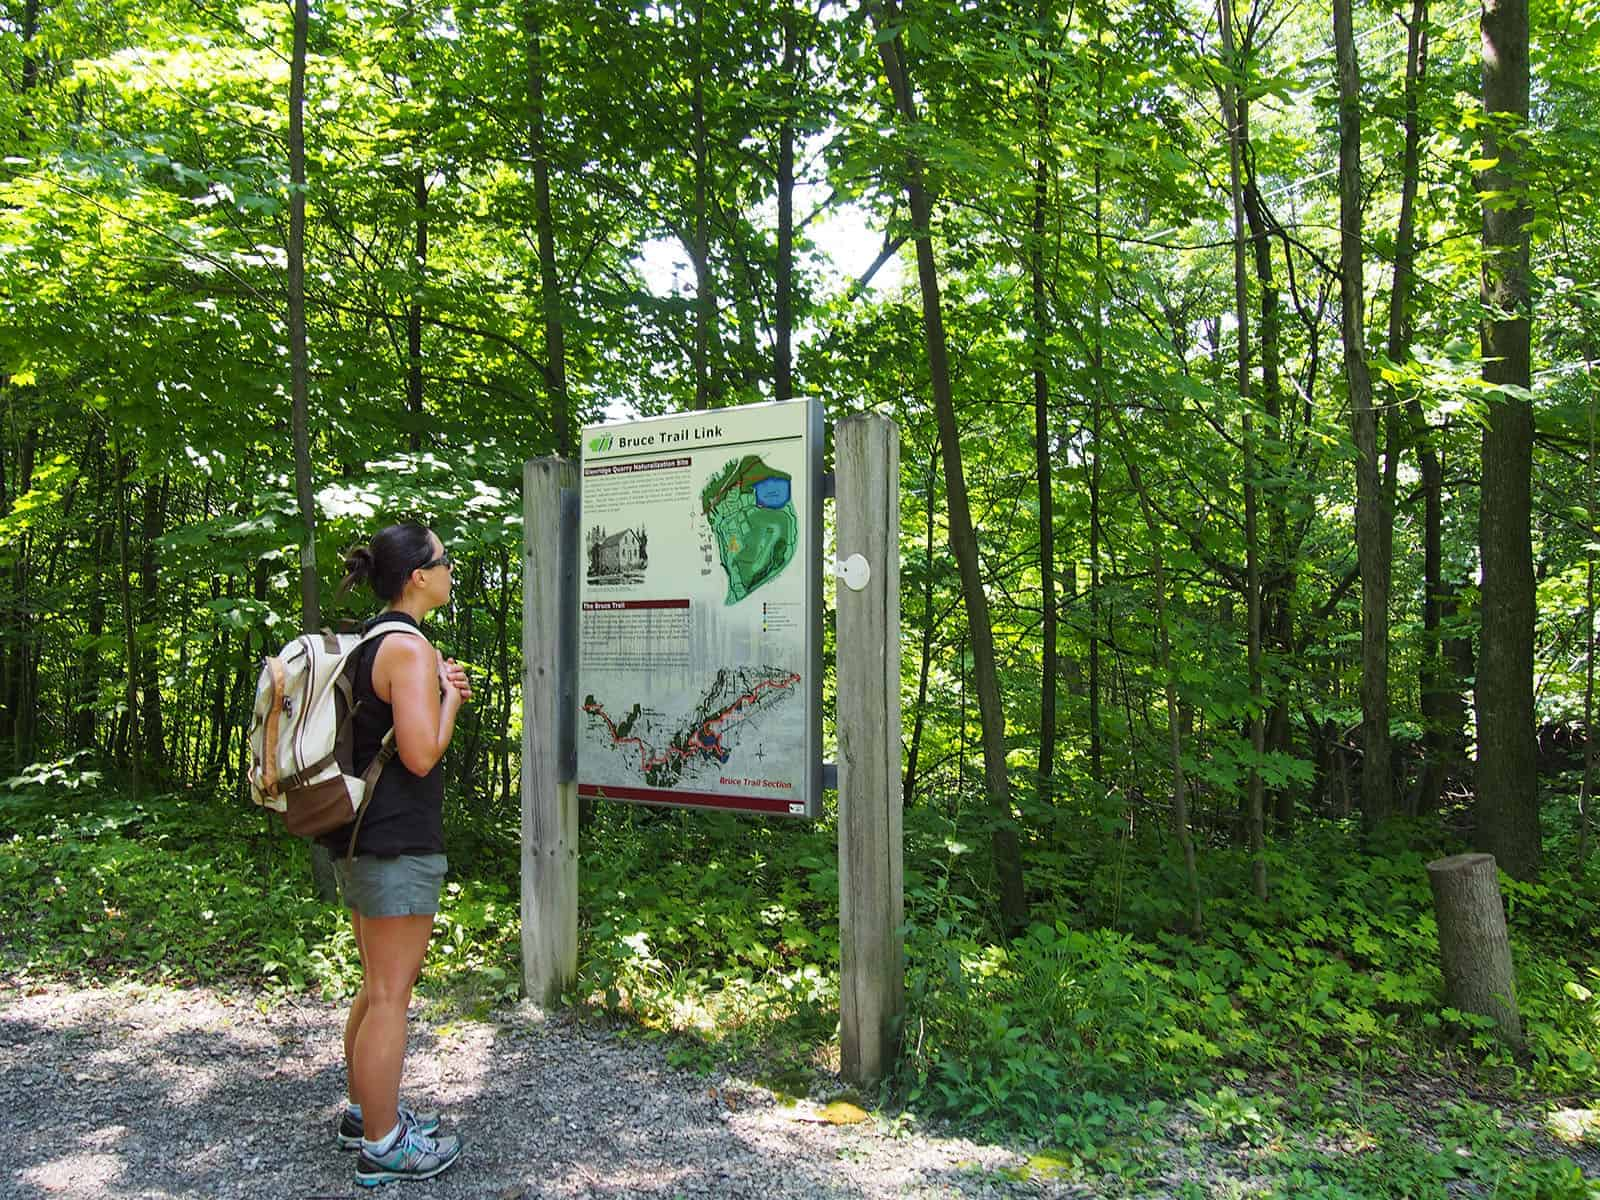 Bruce Trail, Ontario, Canada